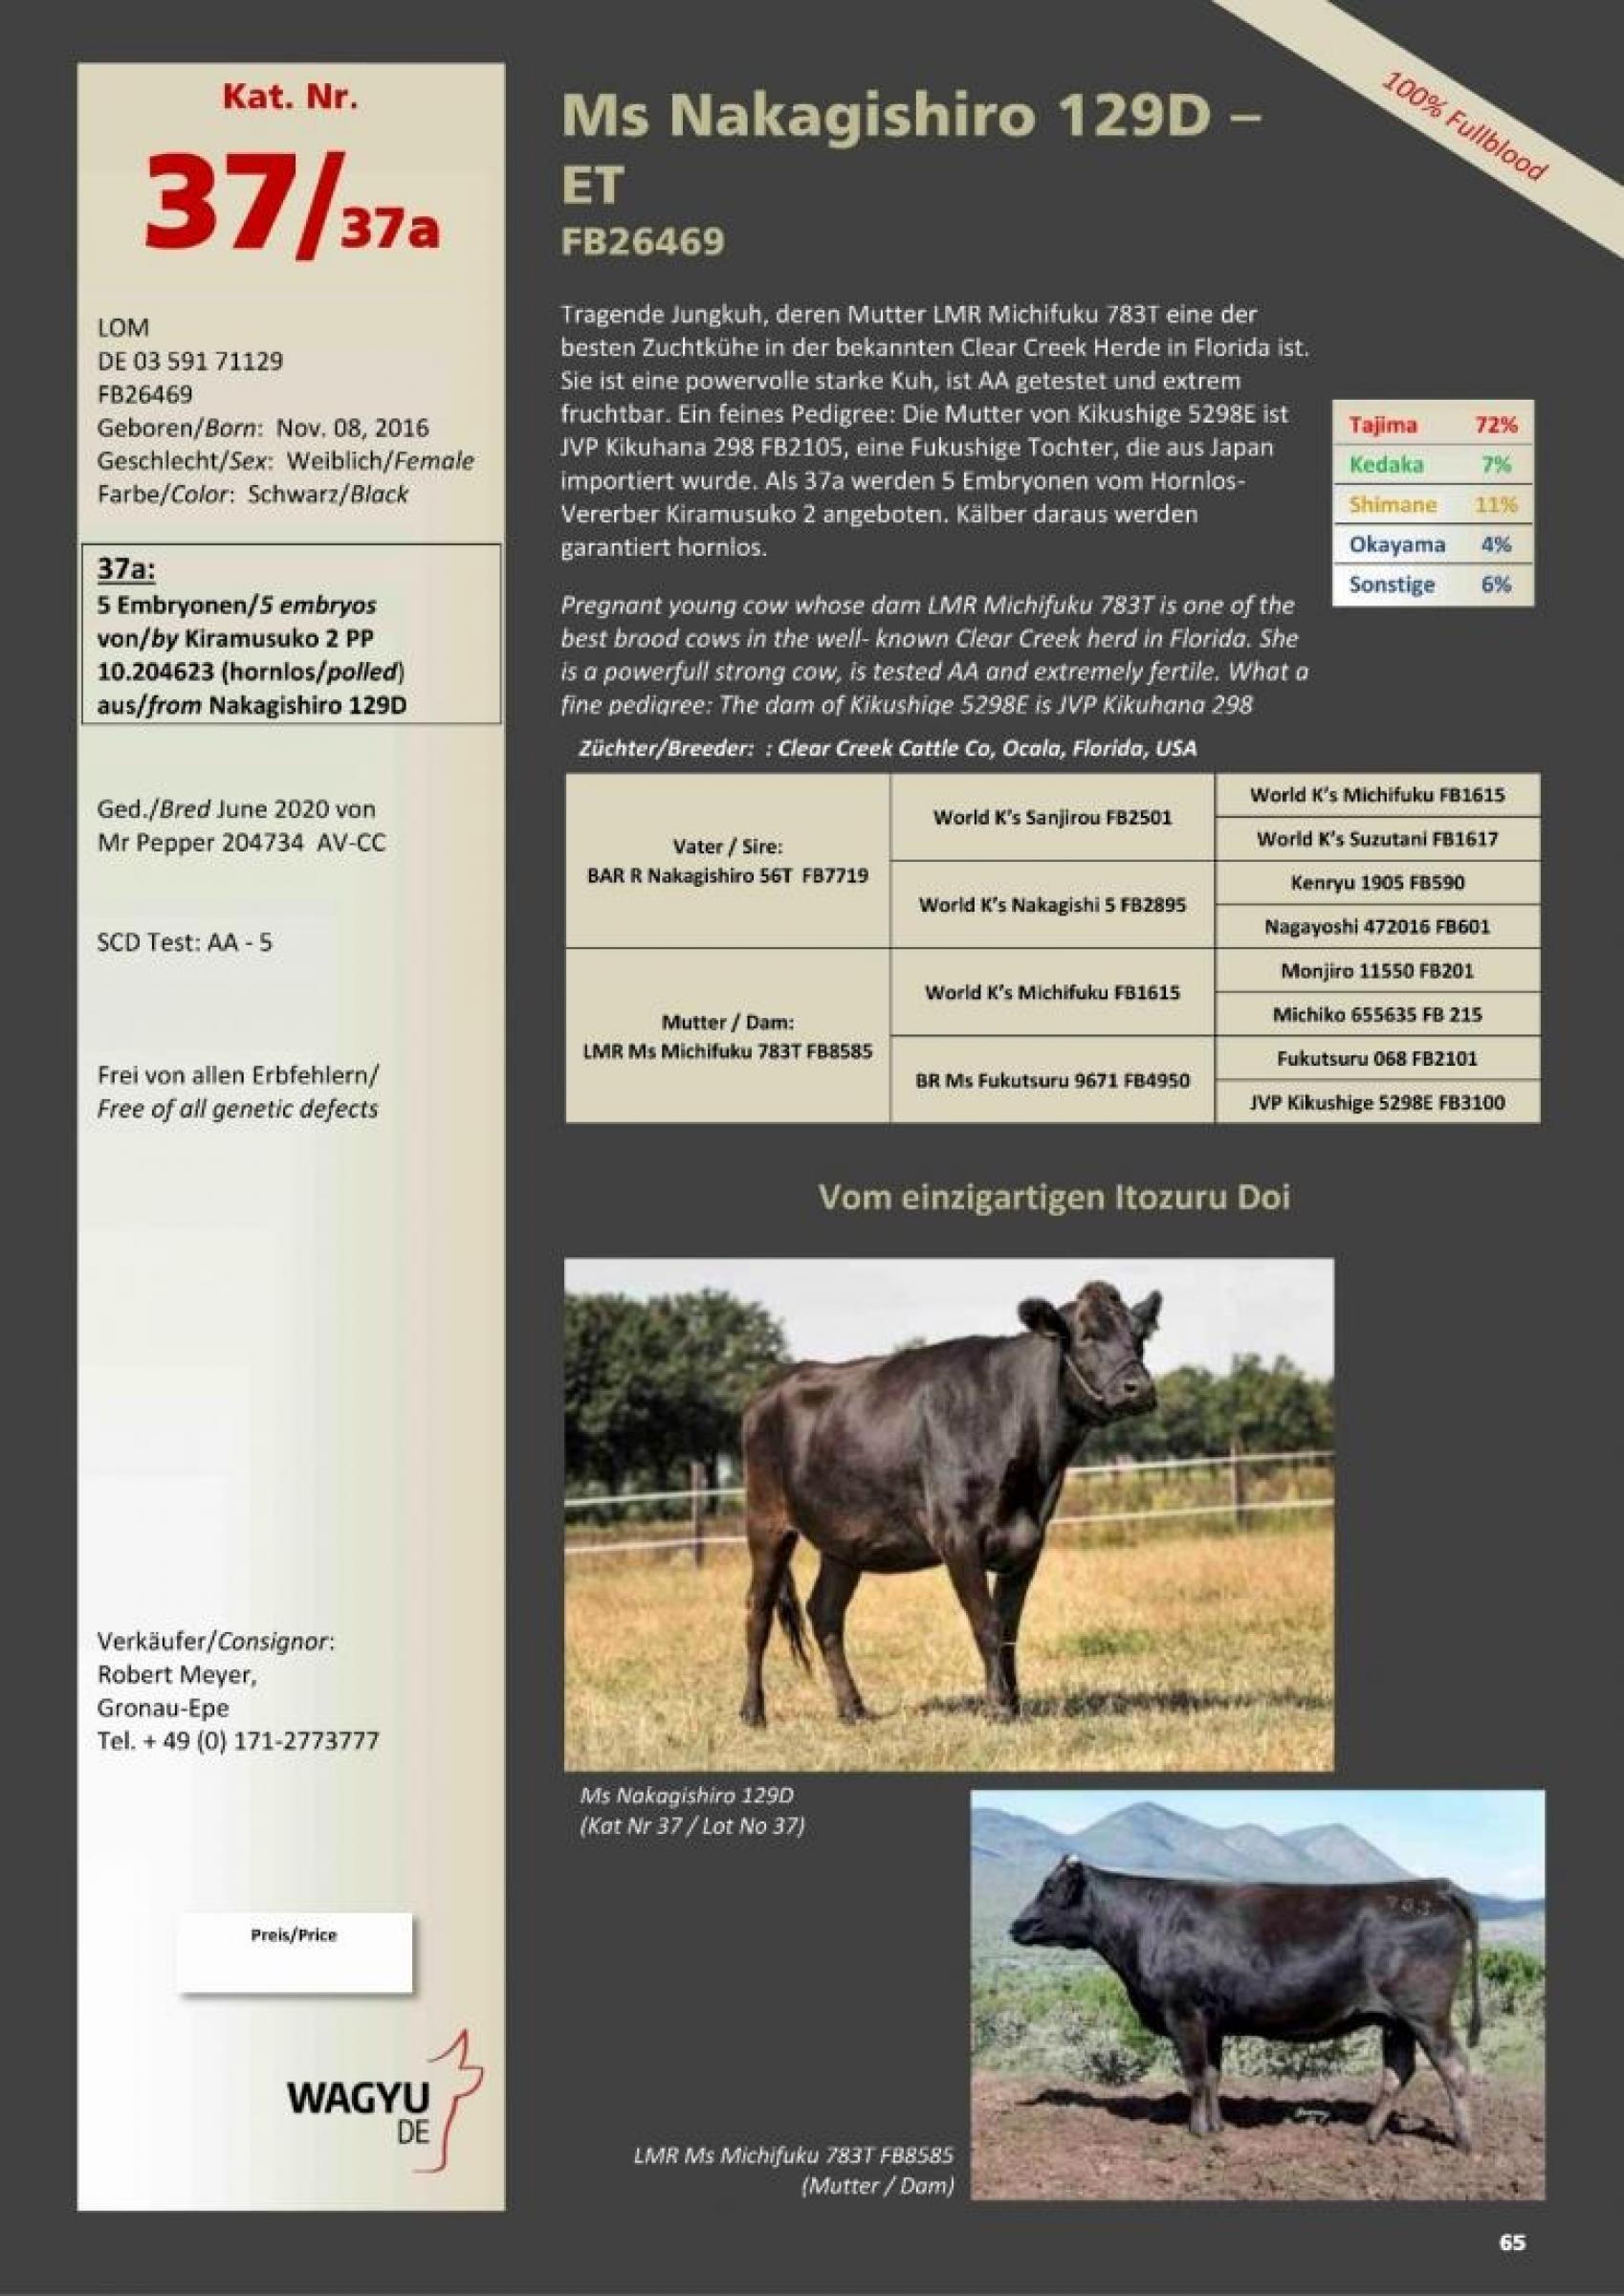 Datasheet for Lot 37A. 5 embryos (Grade A) Kiramusuko 2 PP 10.204623 x Ms Nakagishiro 129D-ET FB26469